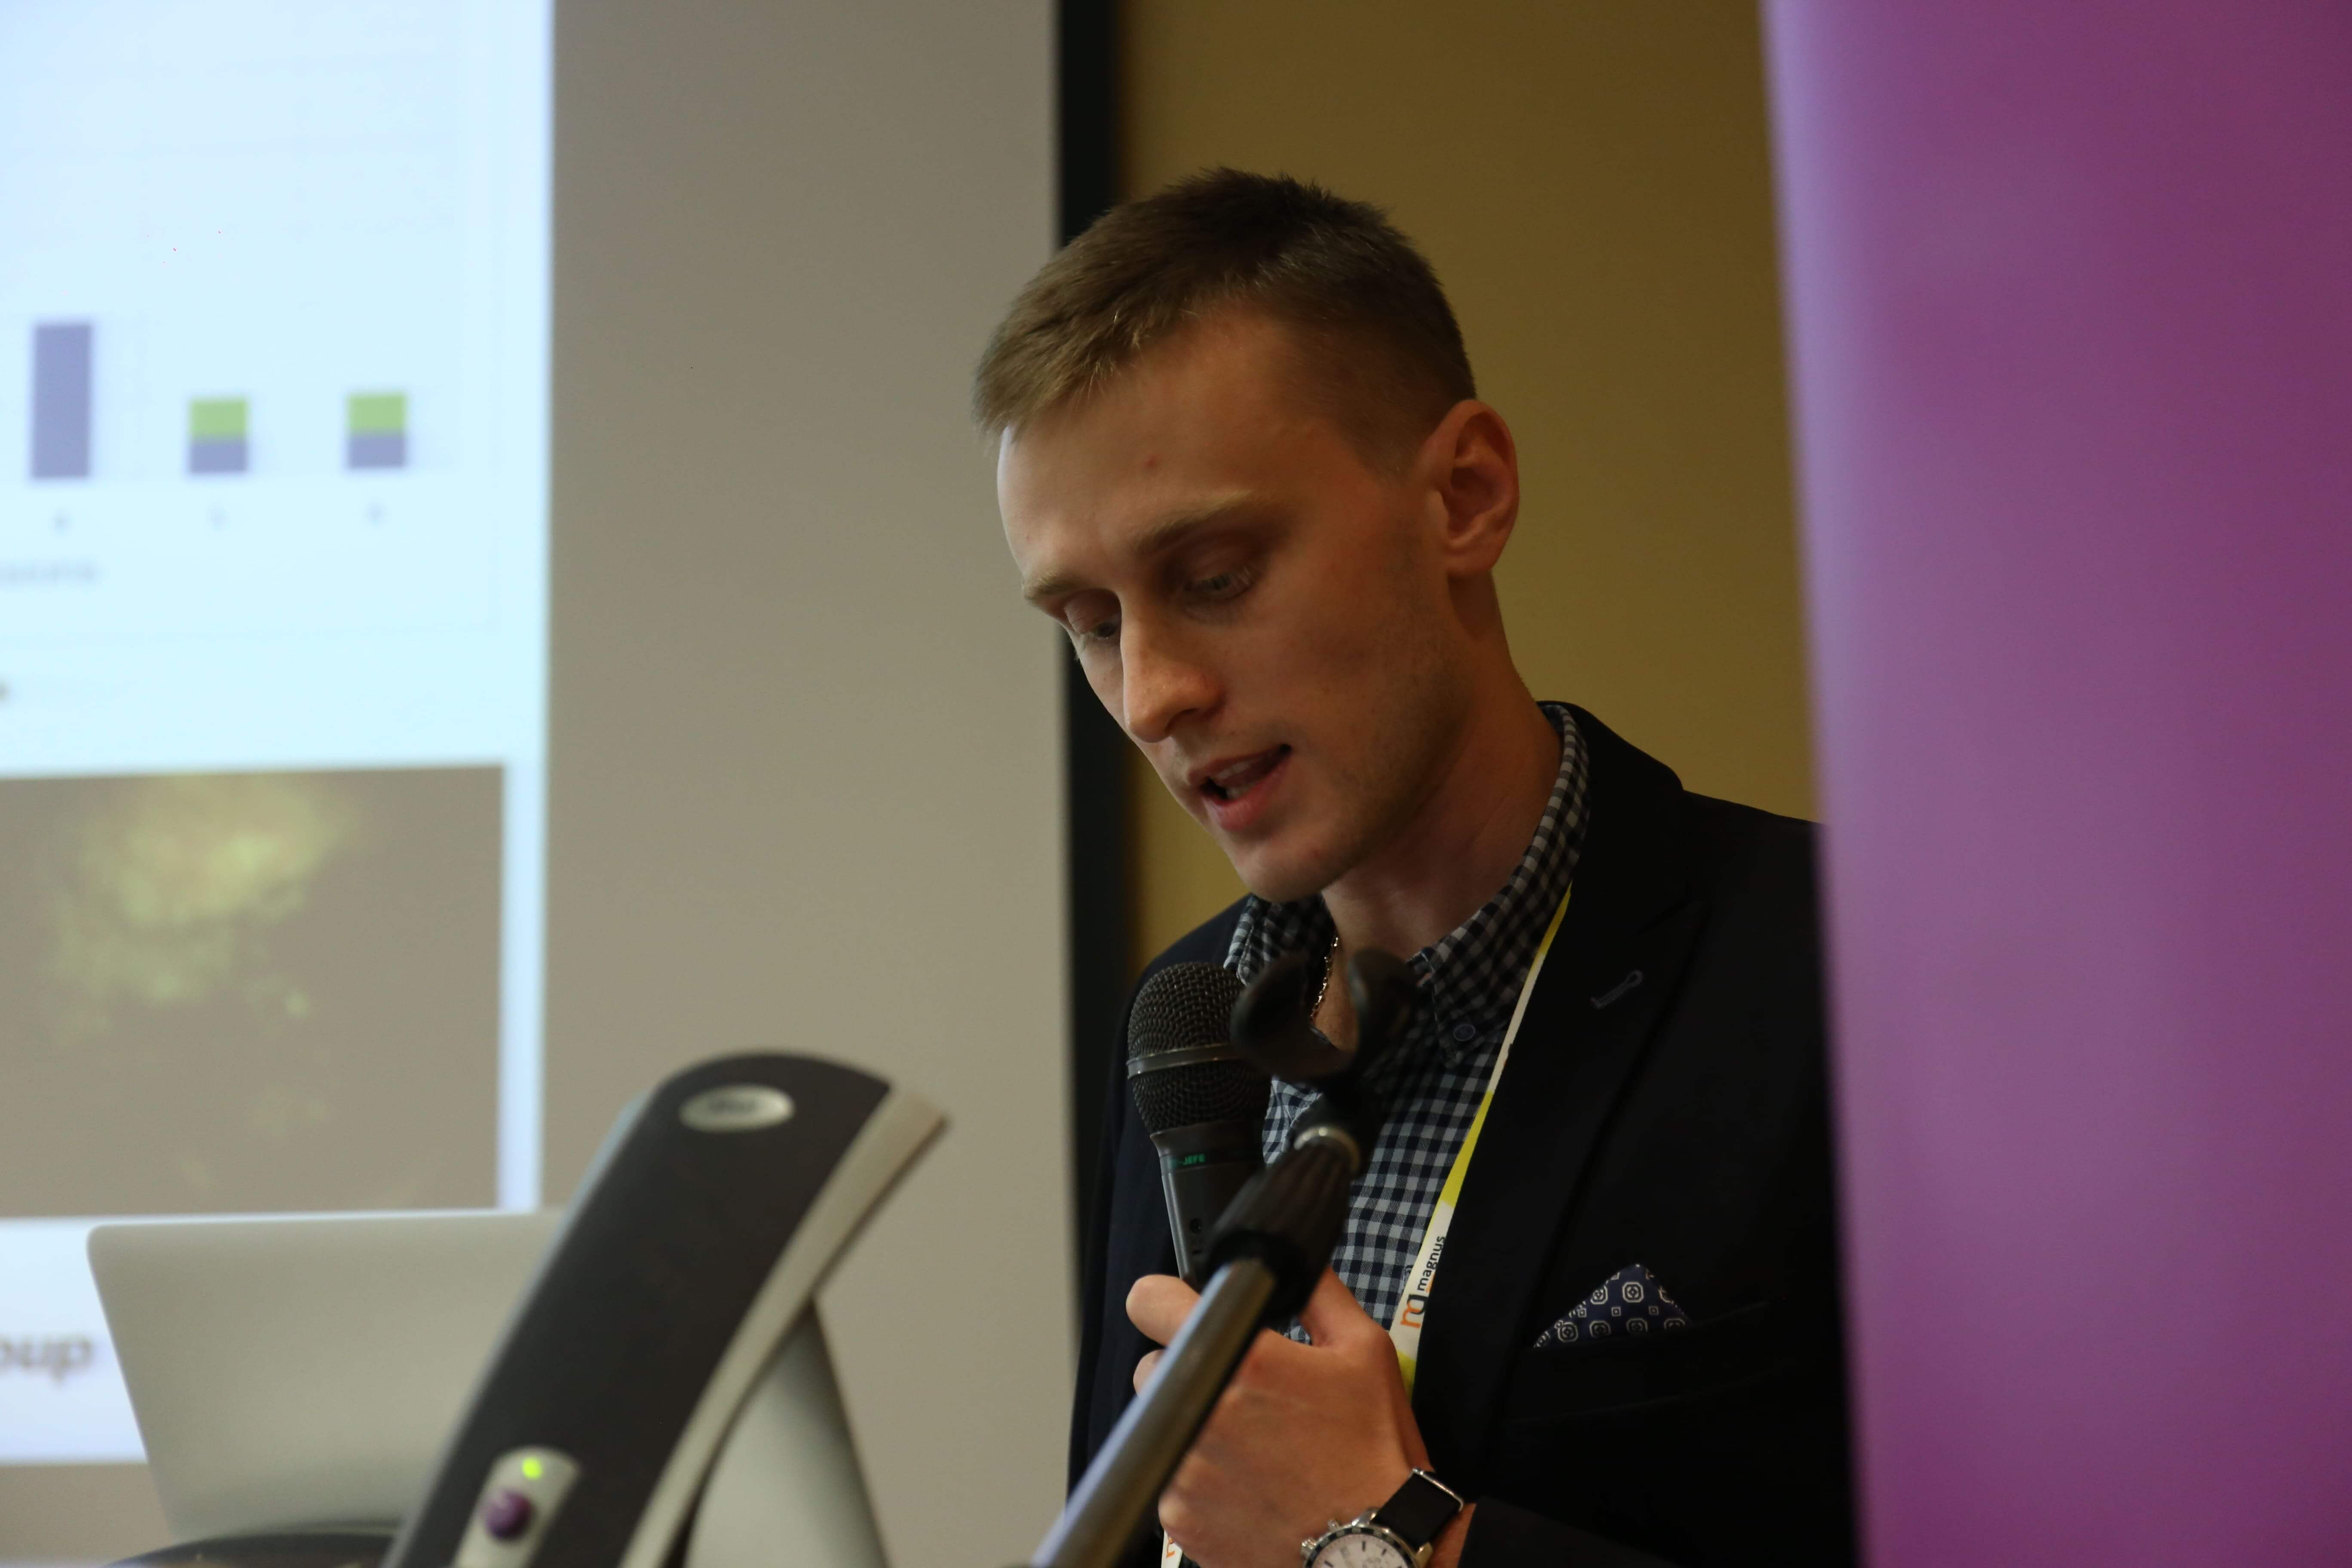 Cancer conference - Igor Pogrebniakov